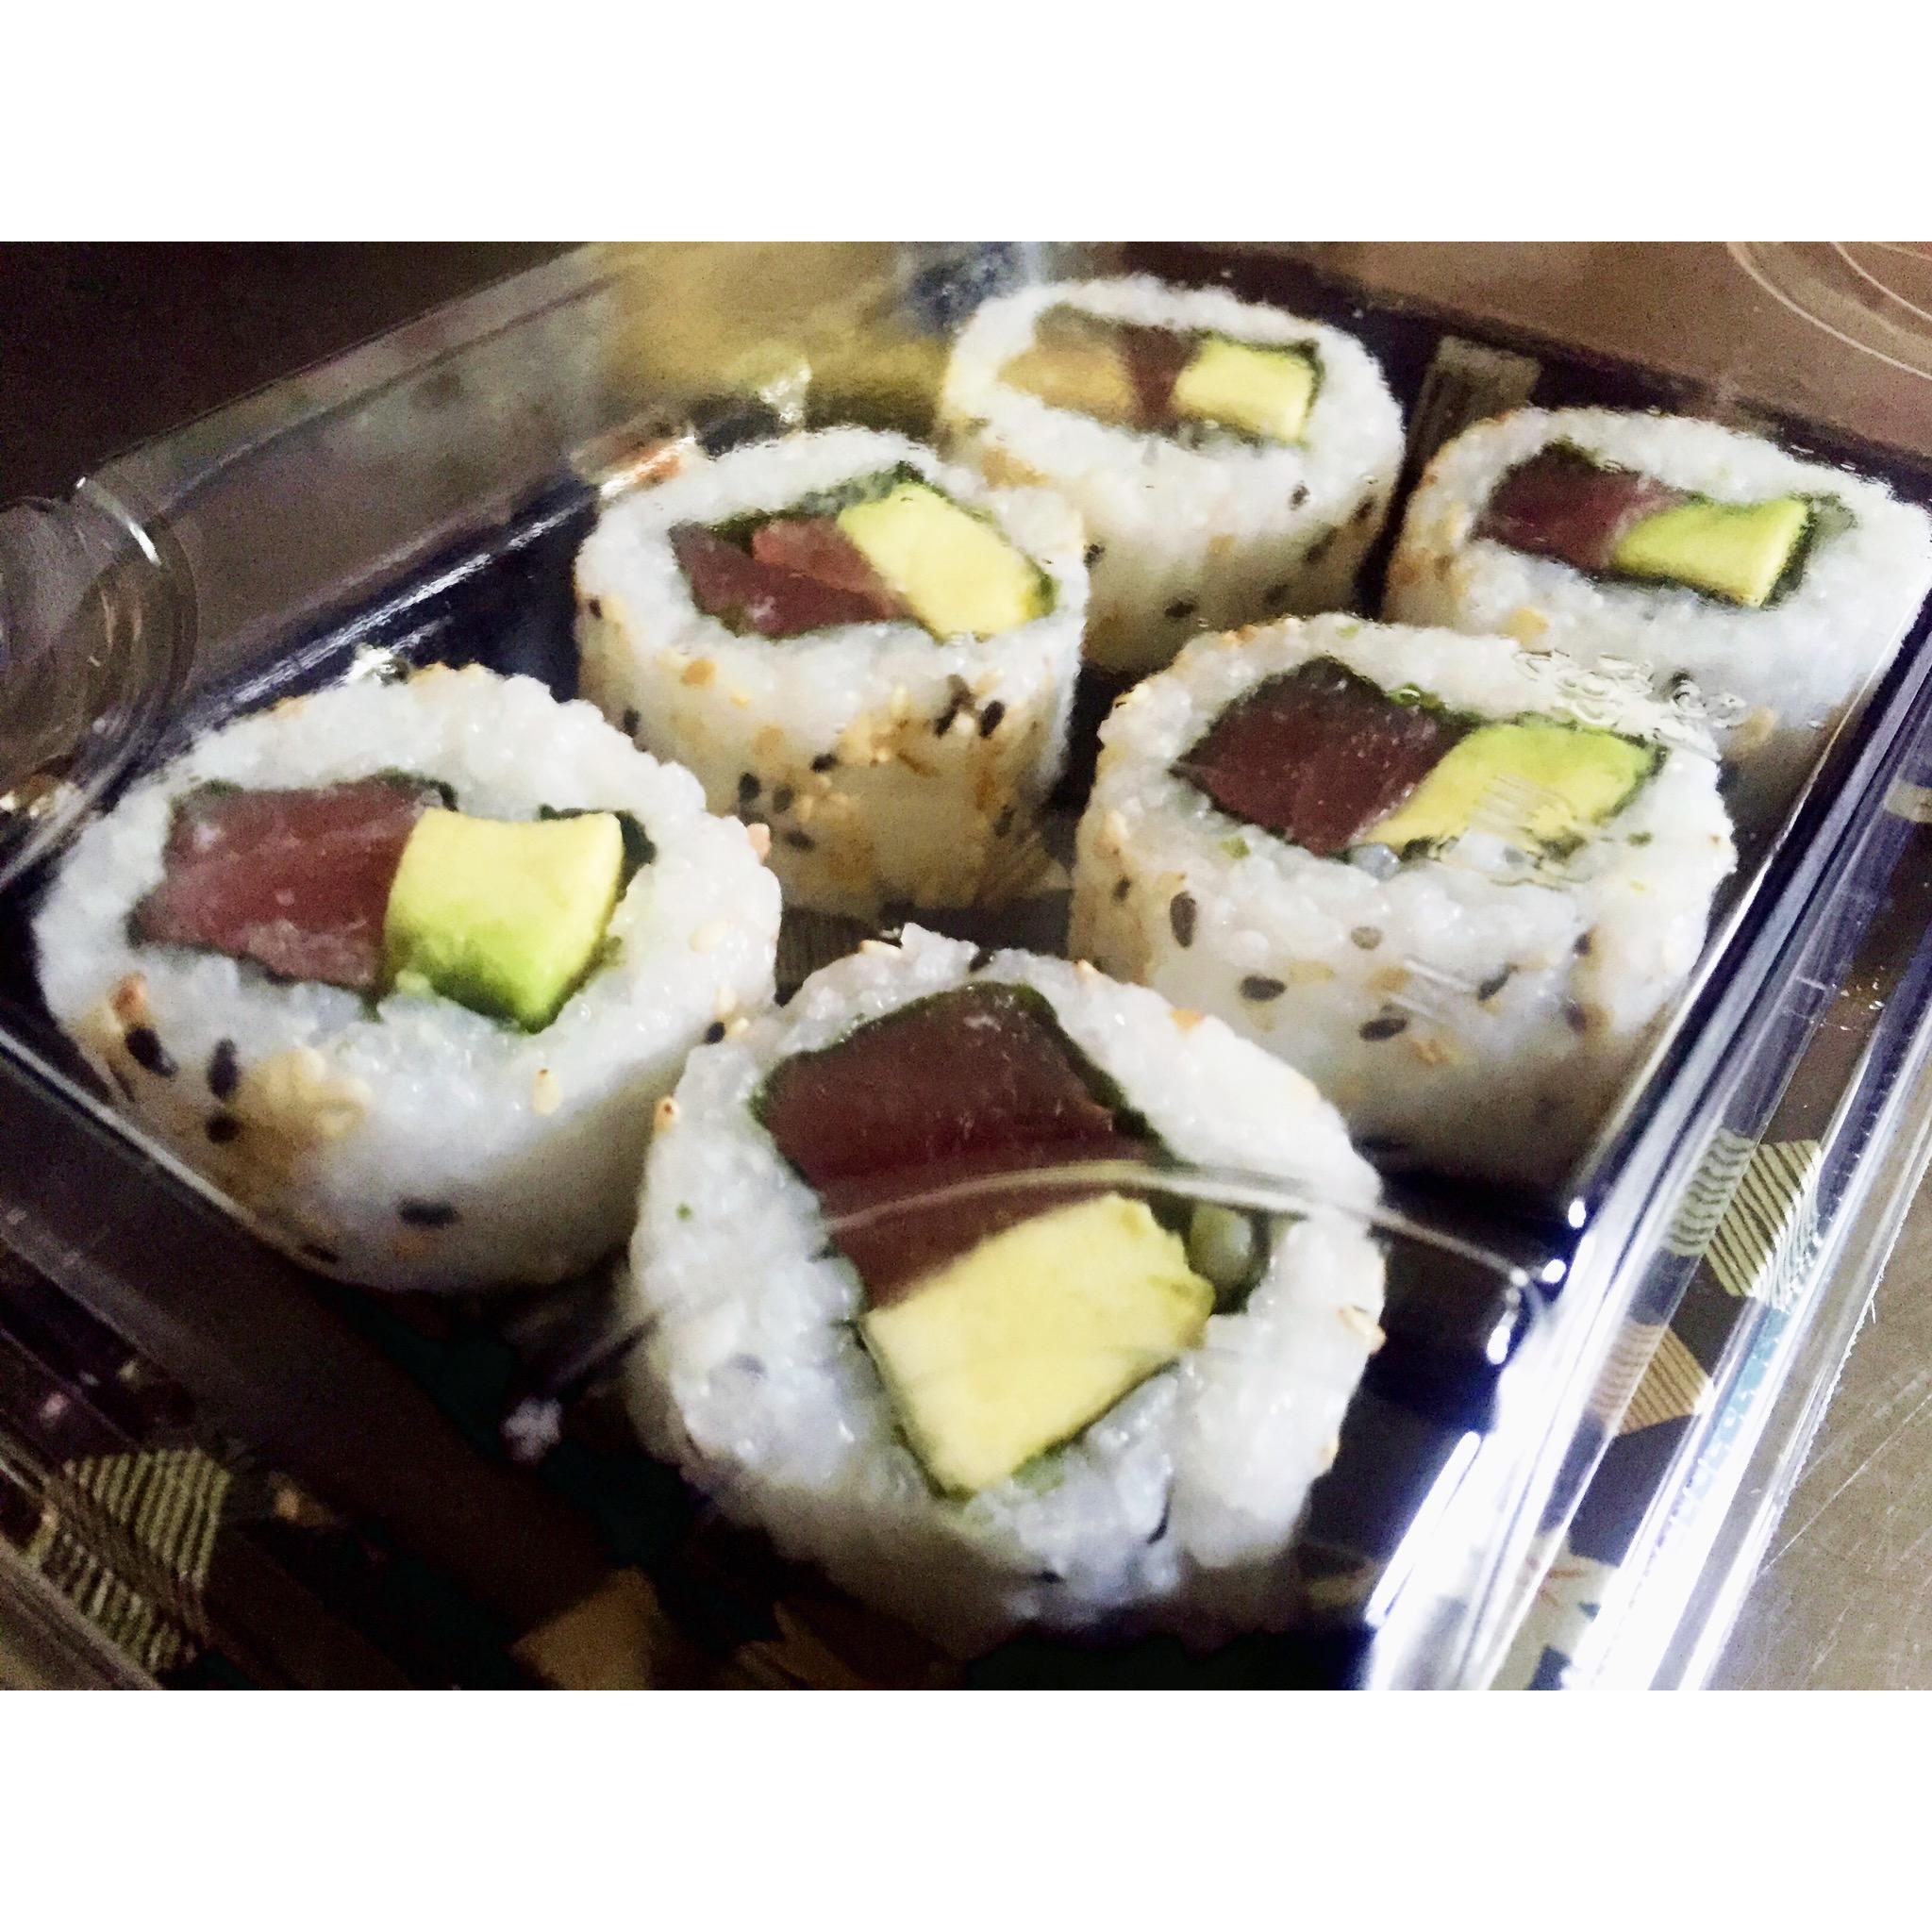 6 x Tuna & Avocado Inside Out Rolls - £7